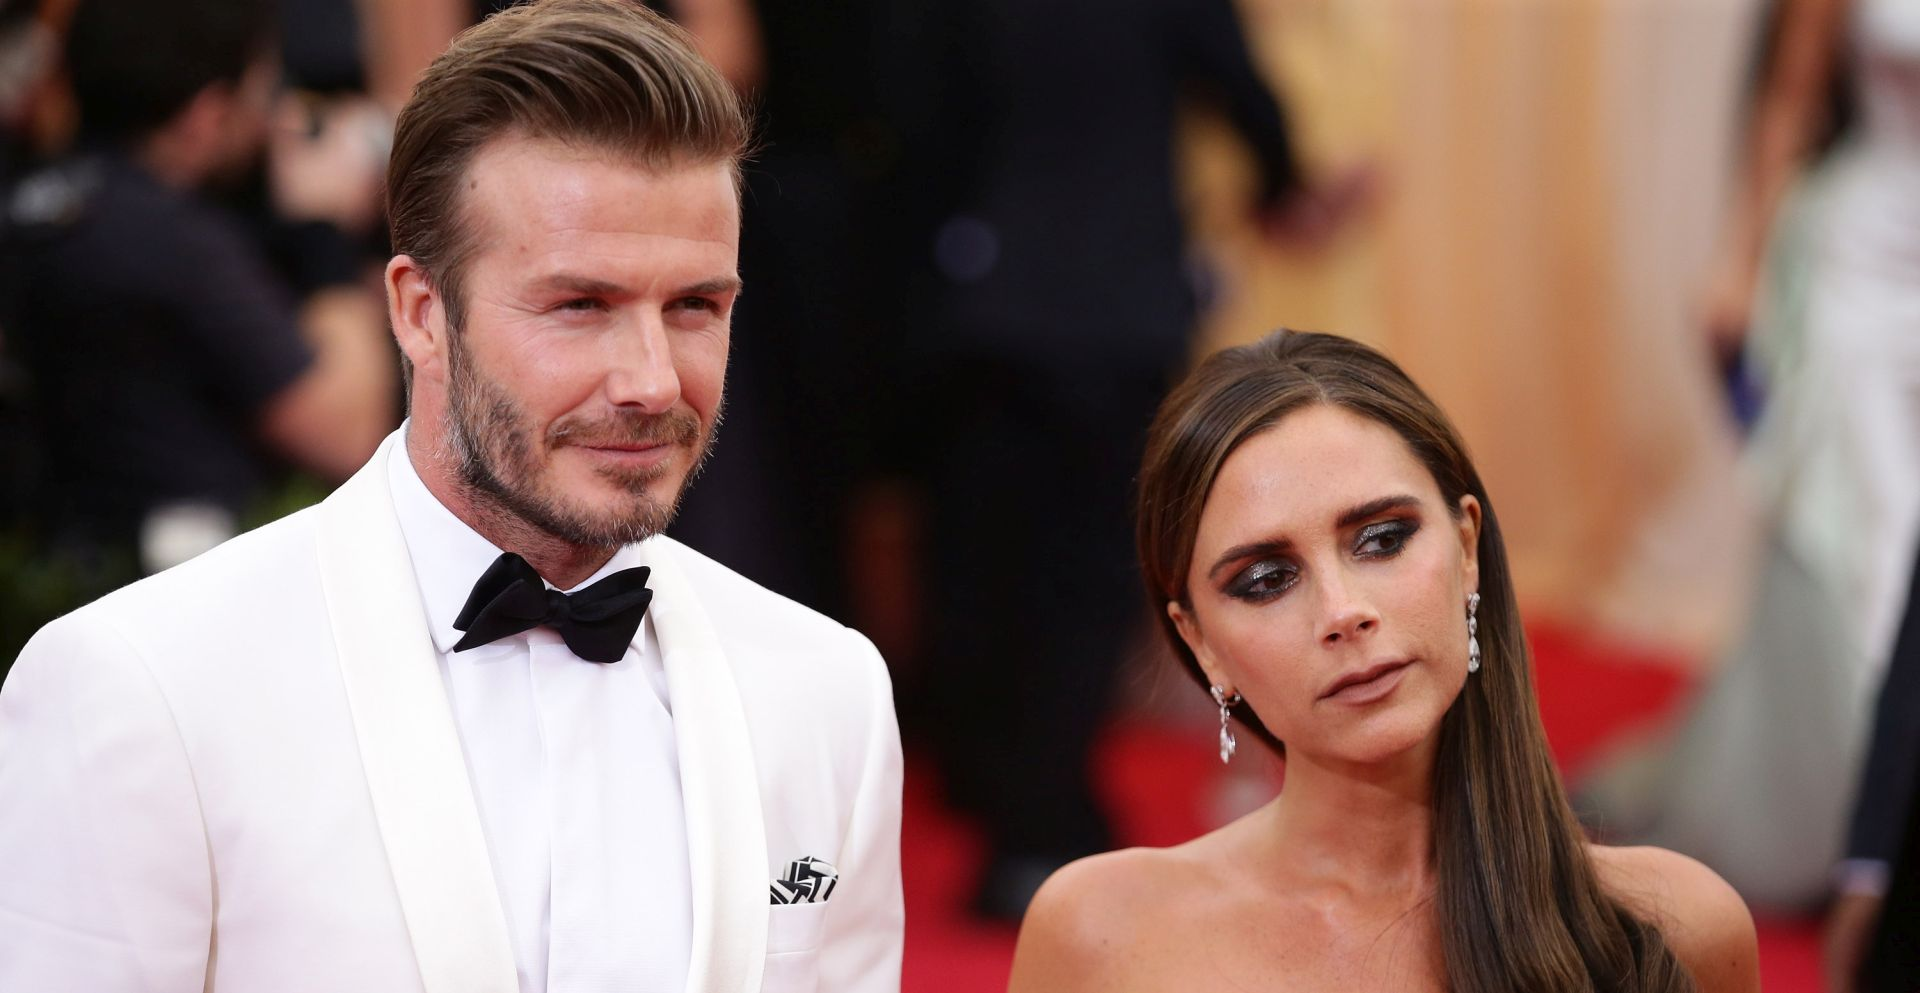 FOTO: David i Victoria Beckham na različite načine reagirali na kritike medija o roditeljstvu